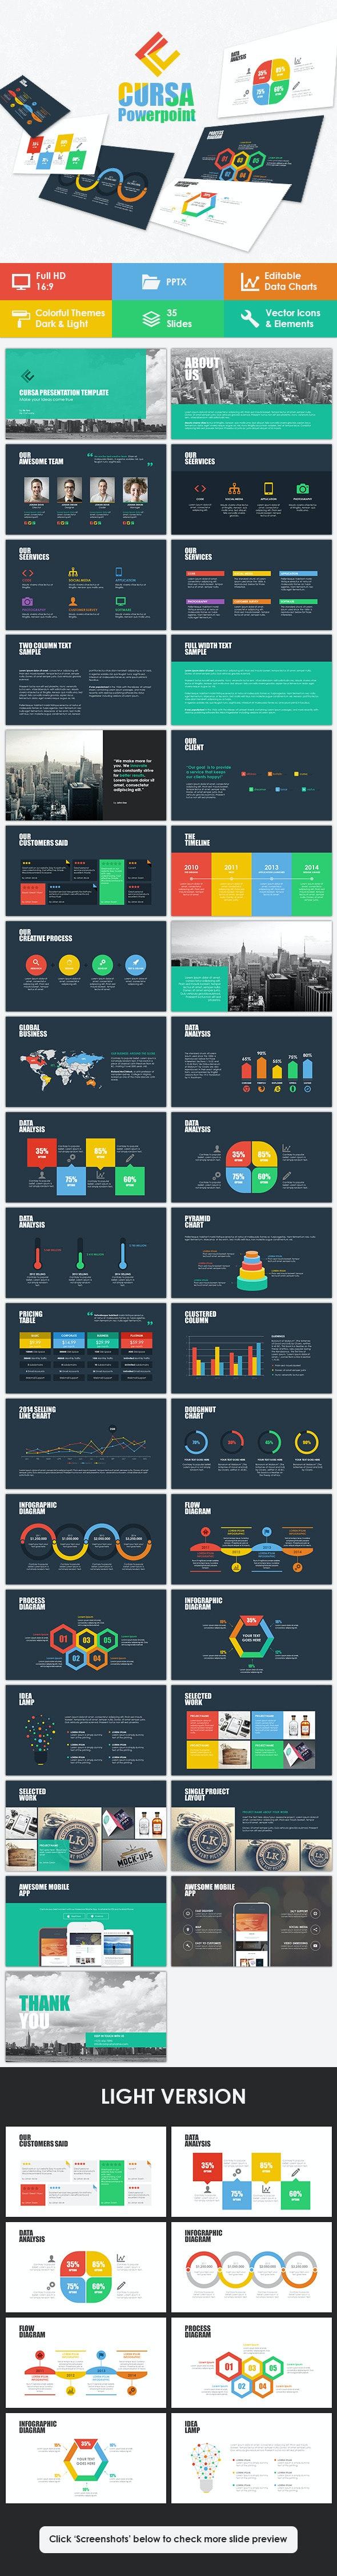 Cursa Powerpoint Template - Business PowerPoint Templates